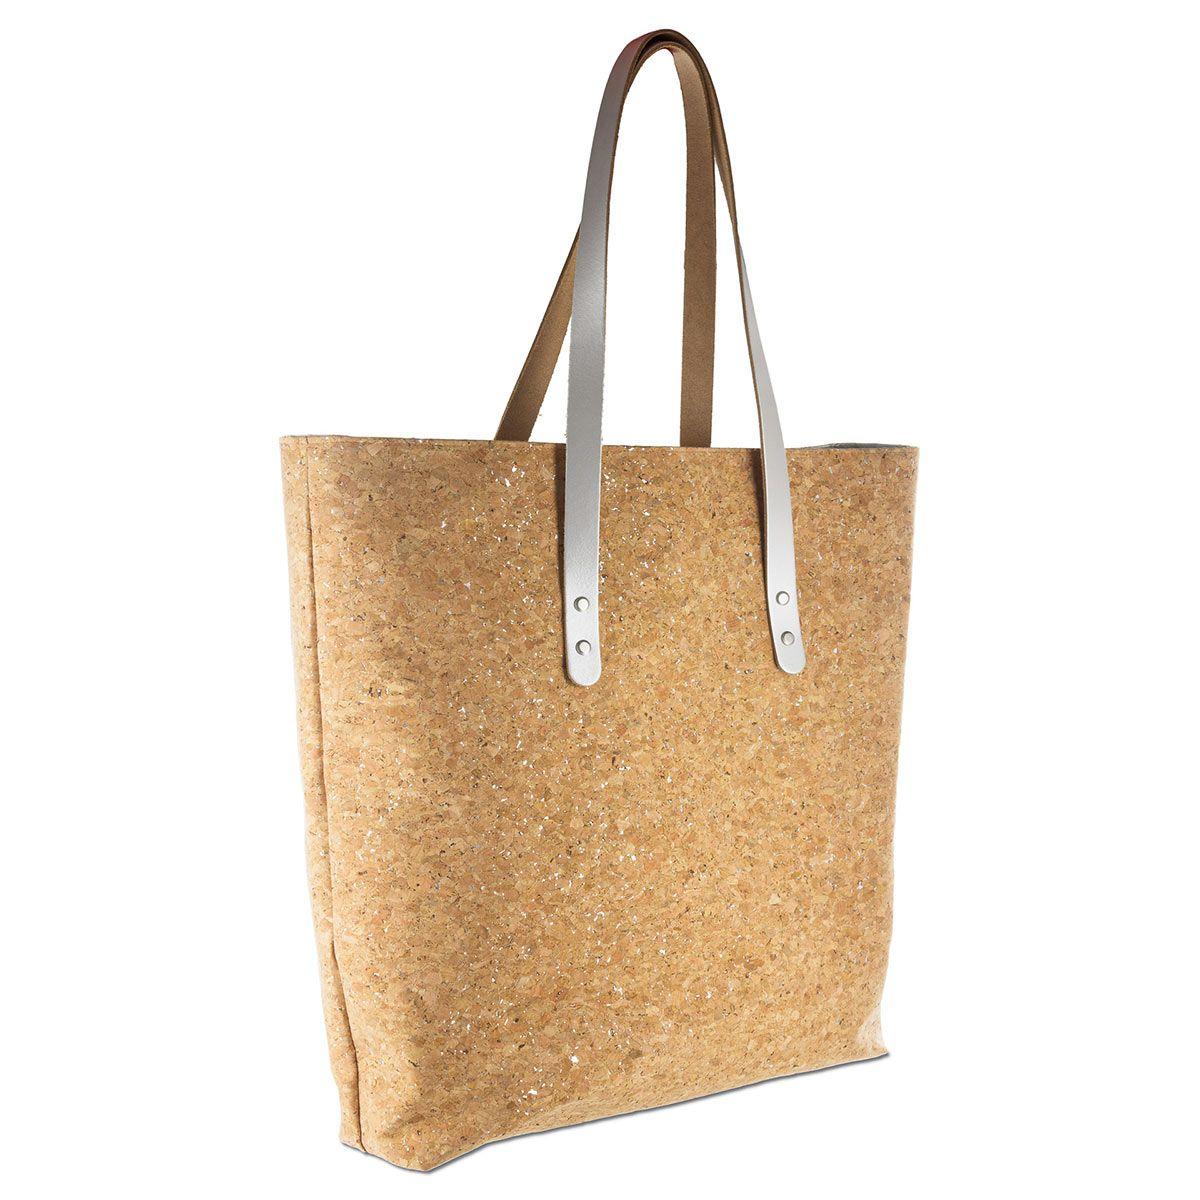 2 lanières tote-bag en cuir - 80 x 2 cm - Nude